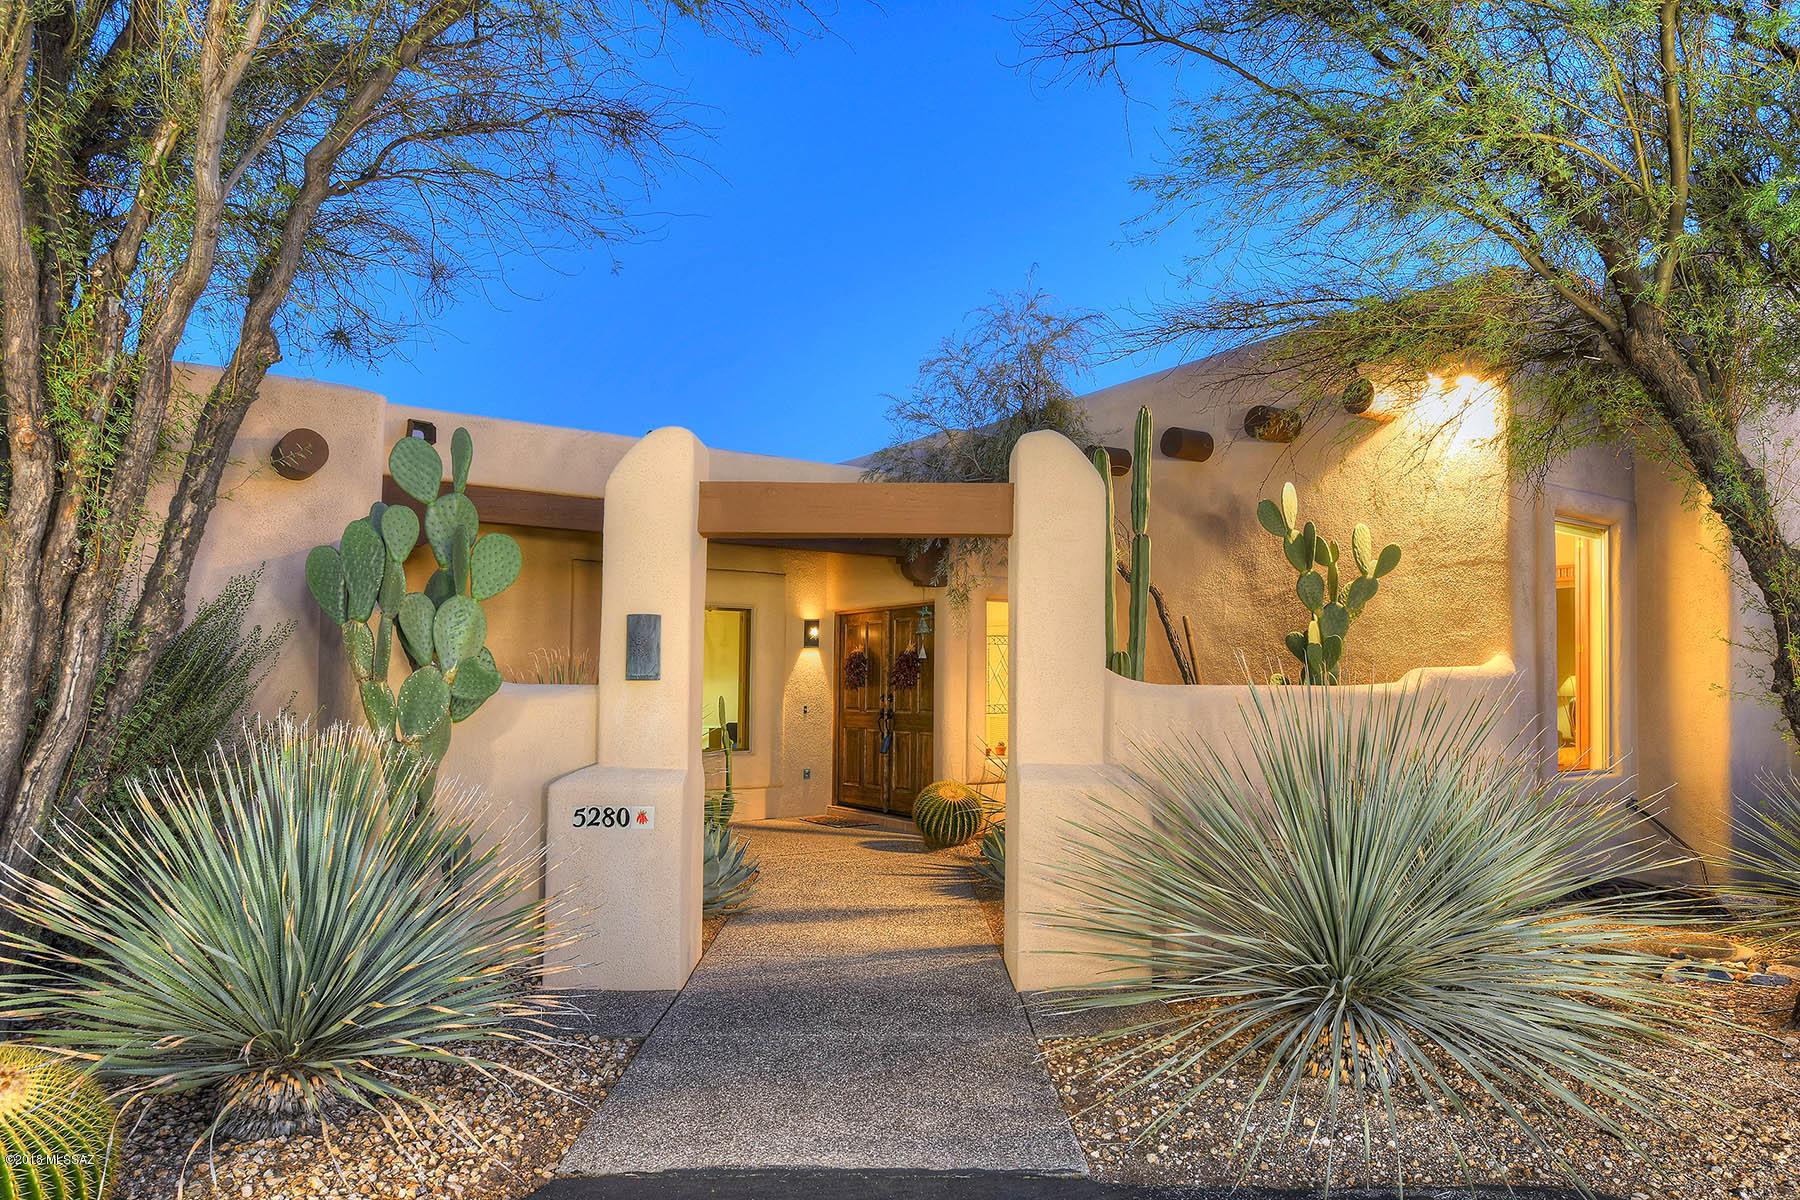 Photo of 5280 N Calle Bujia, Tucson, AZ 85718